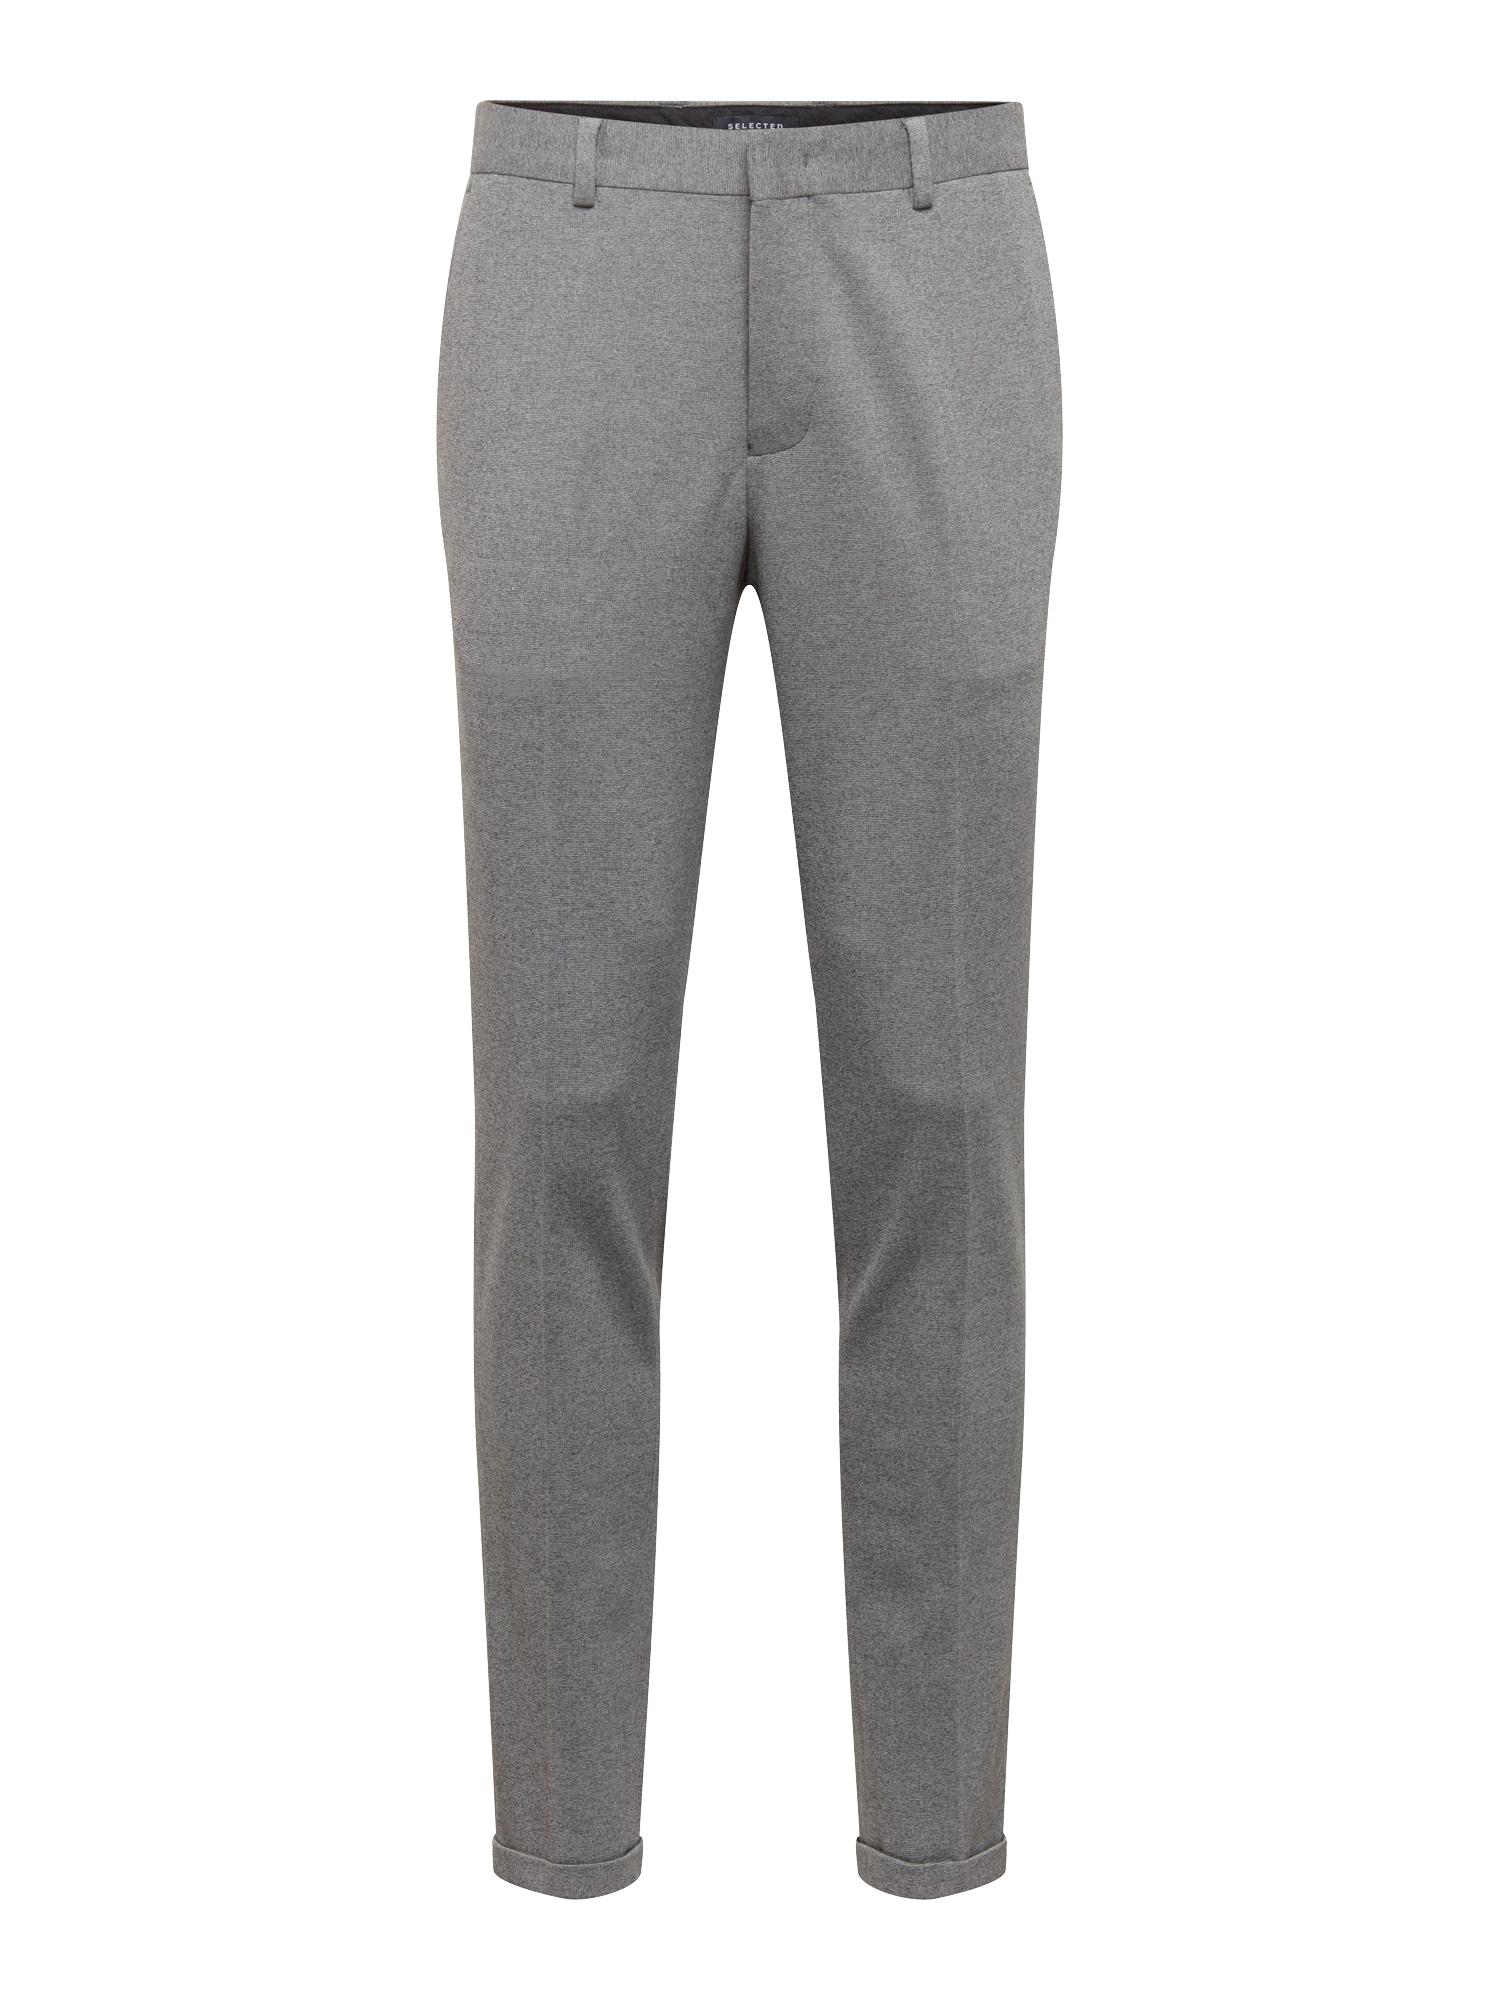 Kalhoty s puky NOOS B šedý melír SELECTED HOMME